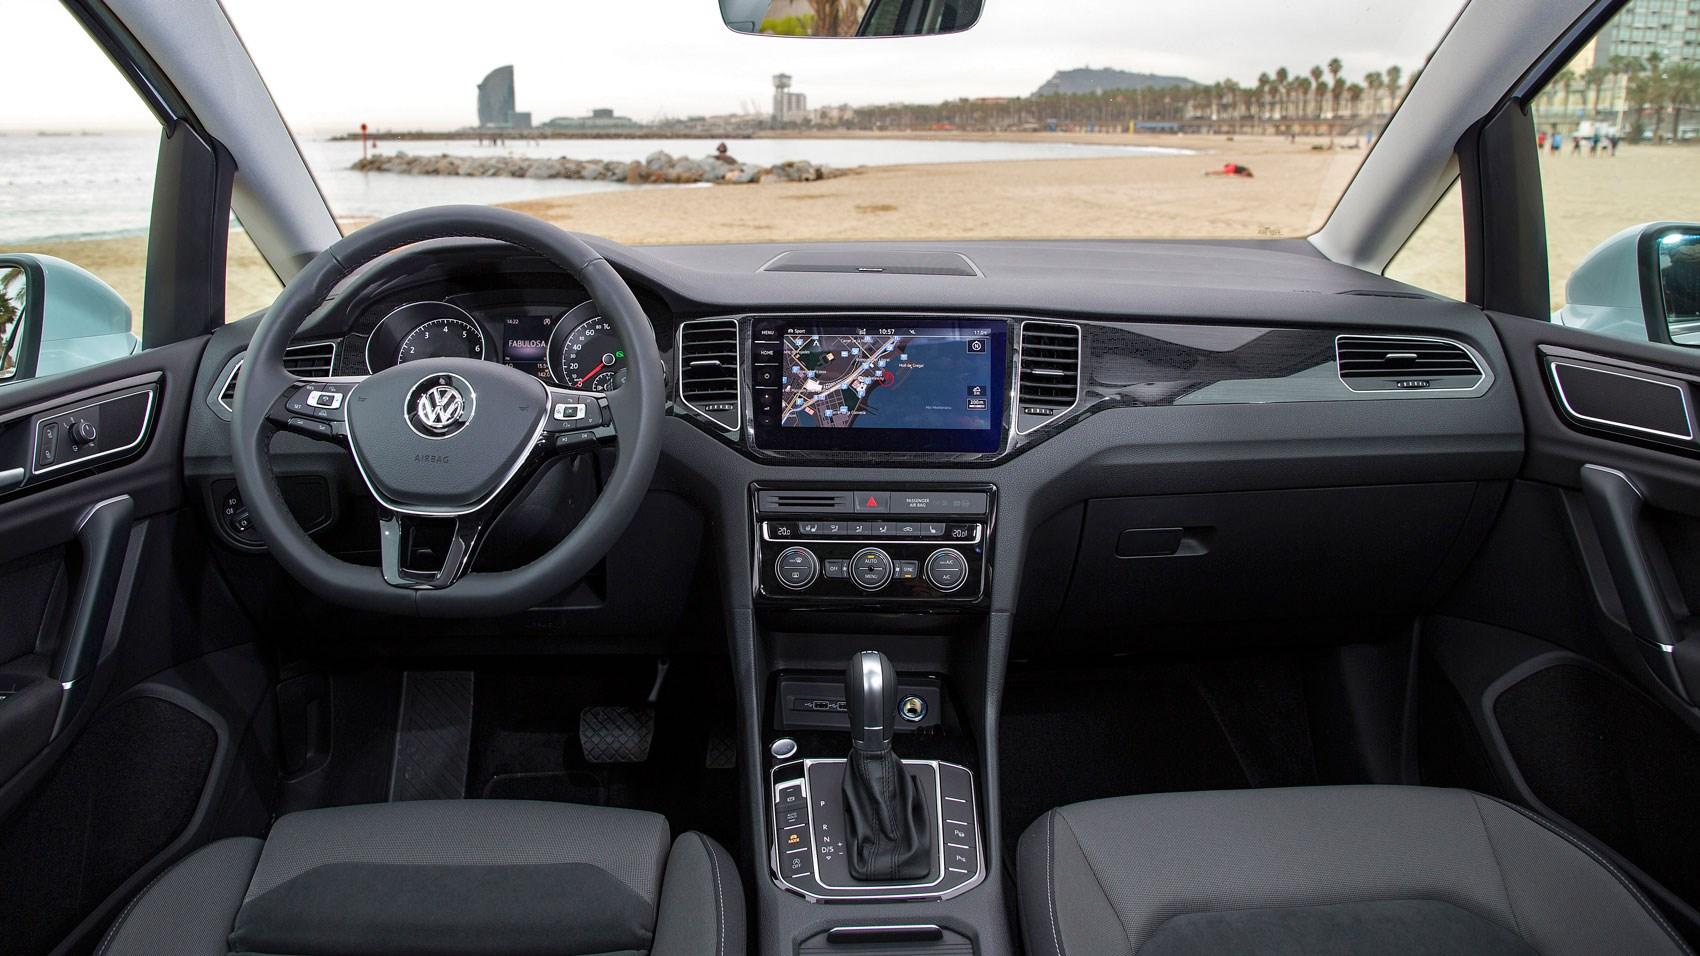 Vw Golf Sv 2018 Review Car Magazine